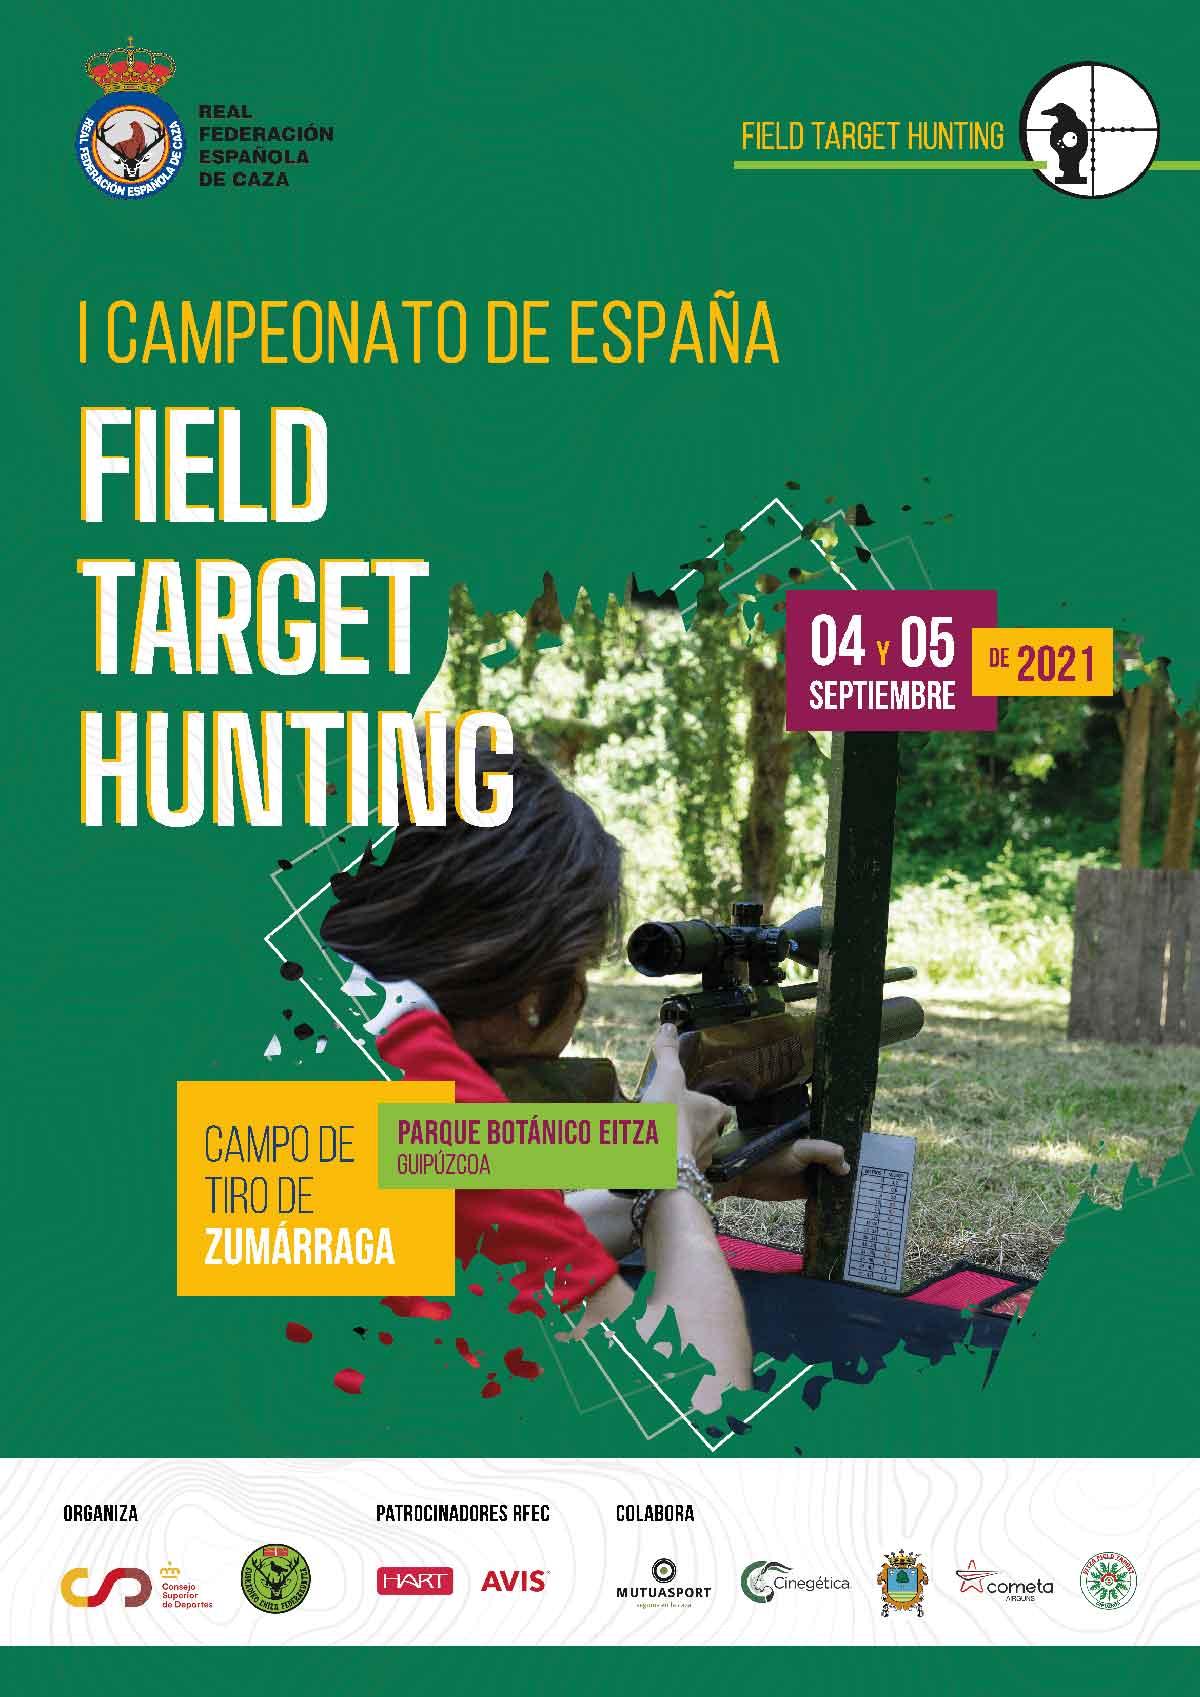 I-Campeonato-Field Target-Hunting